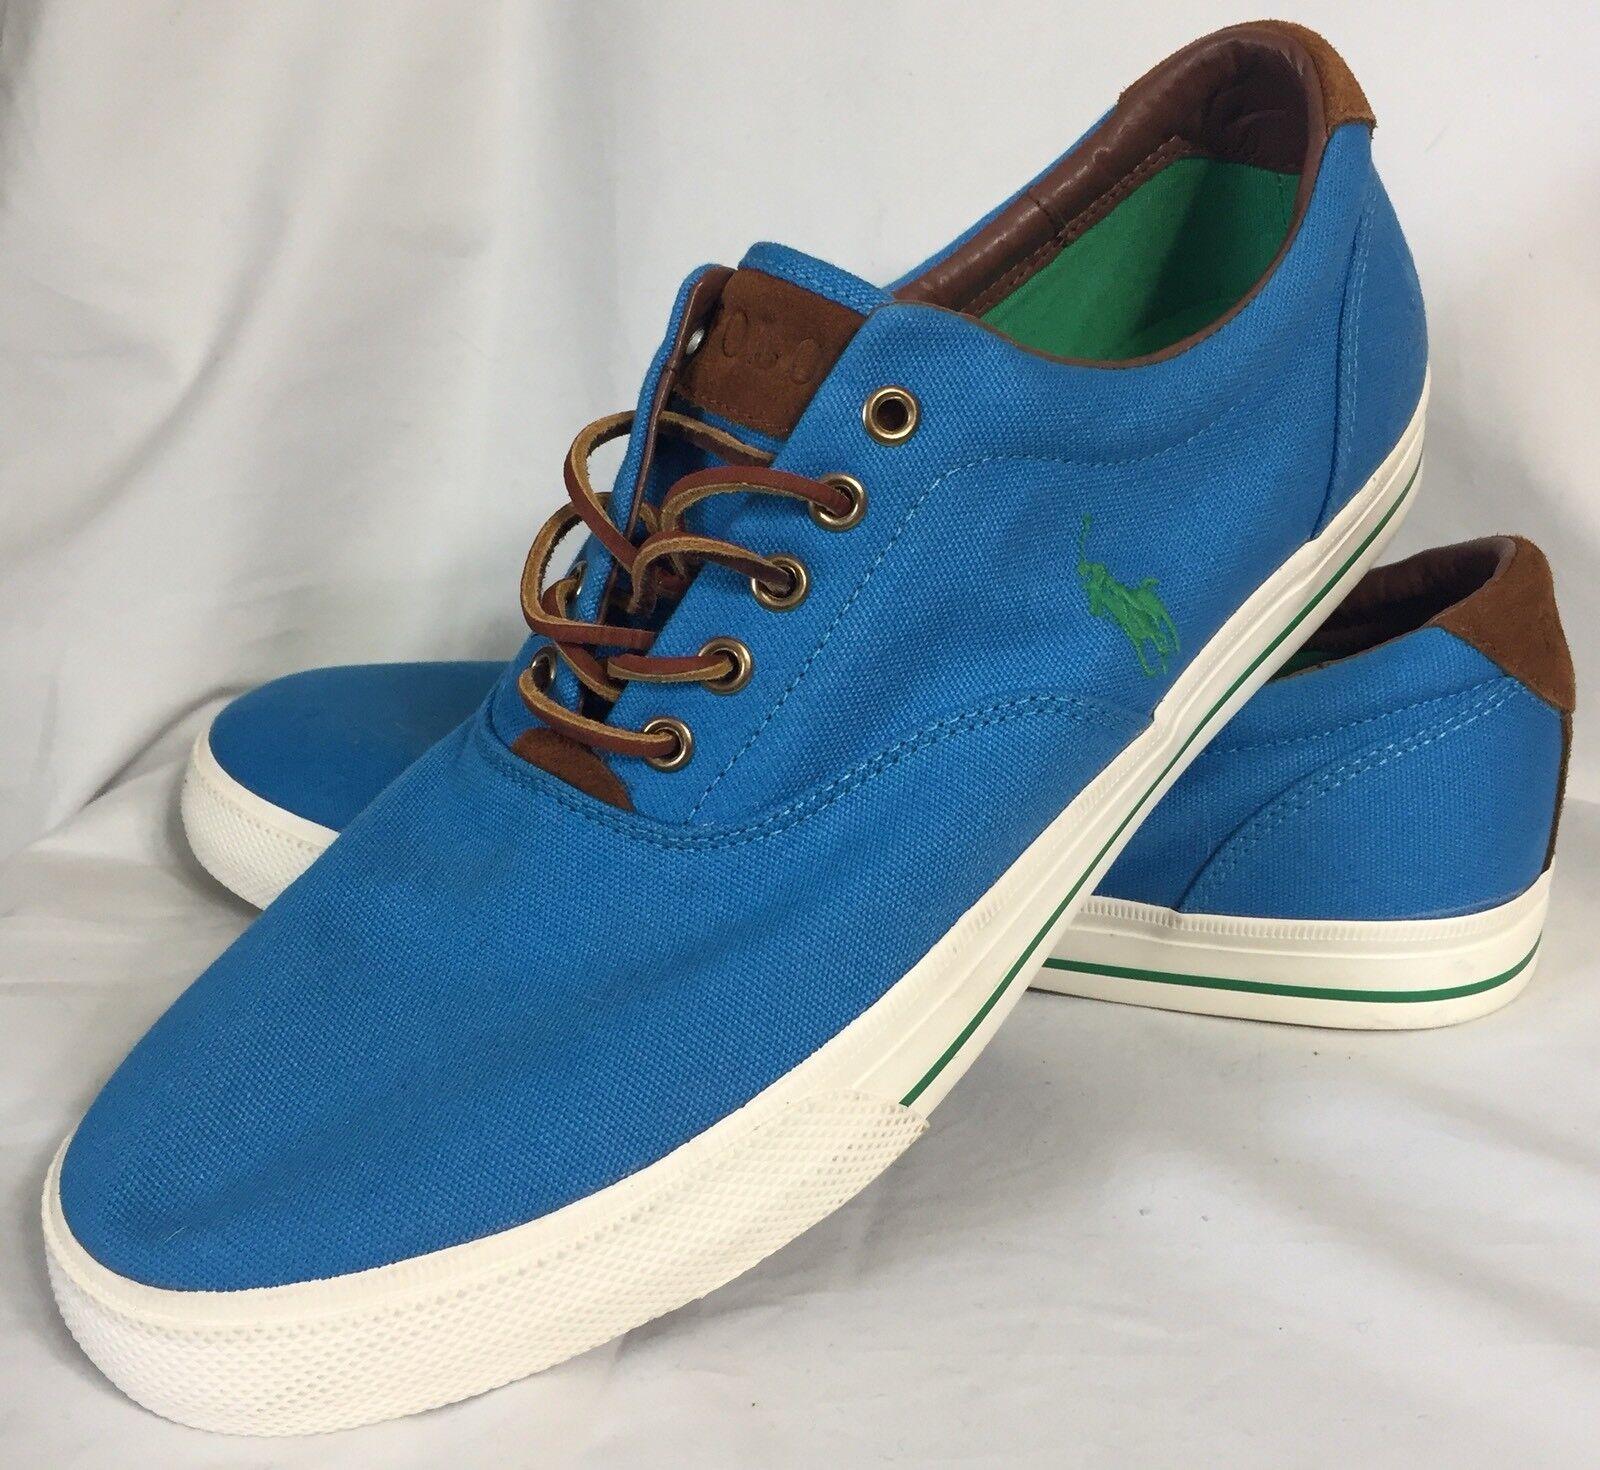 Polo Ralph Lauren Vaughn Fashion Sneakers Size 14 D bluee Canvas Leather Trim